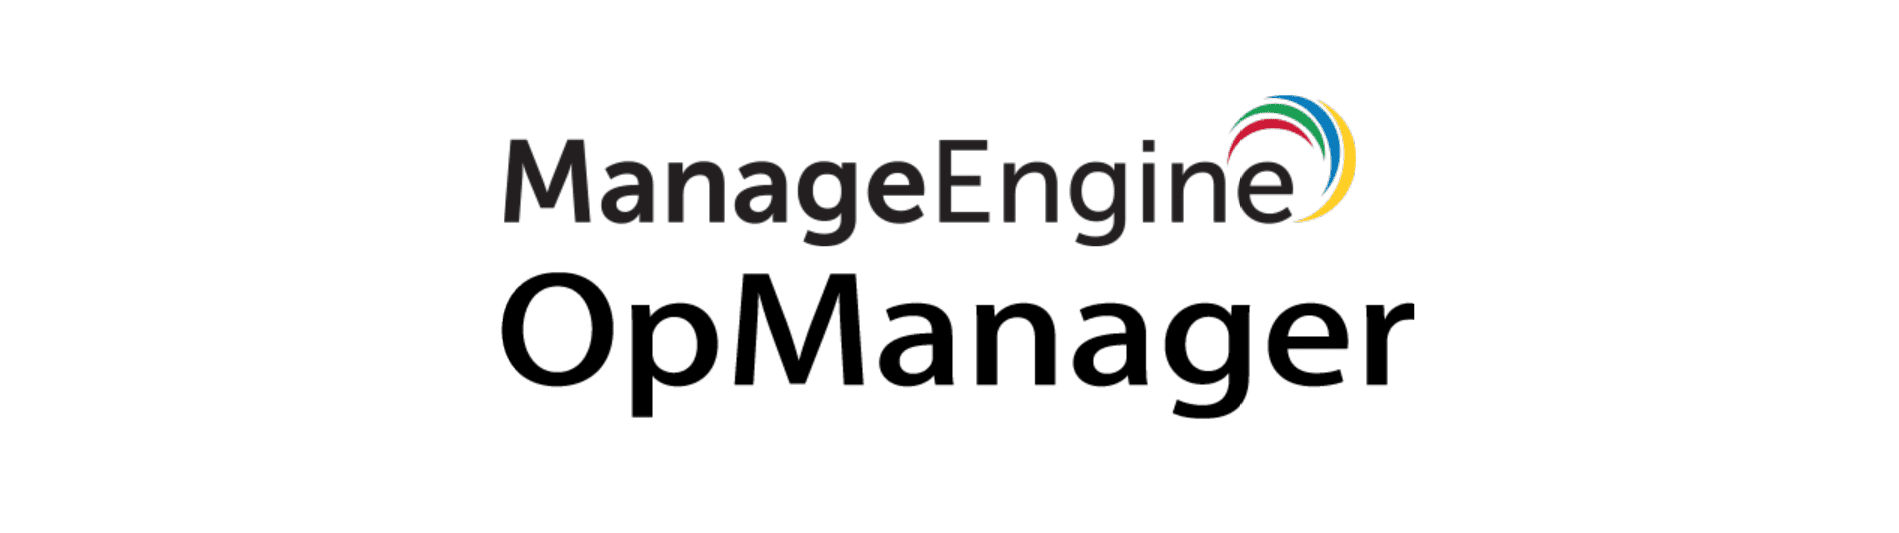 ManageEngine Türkiye